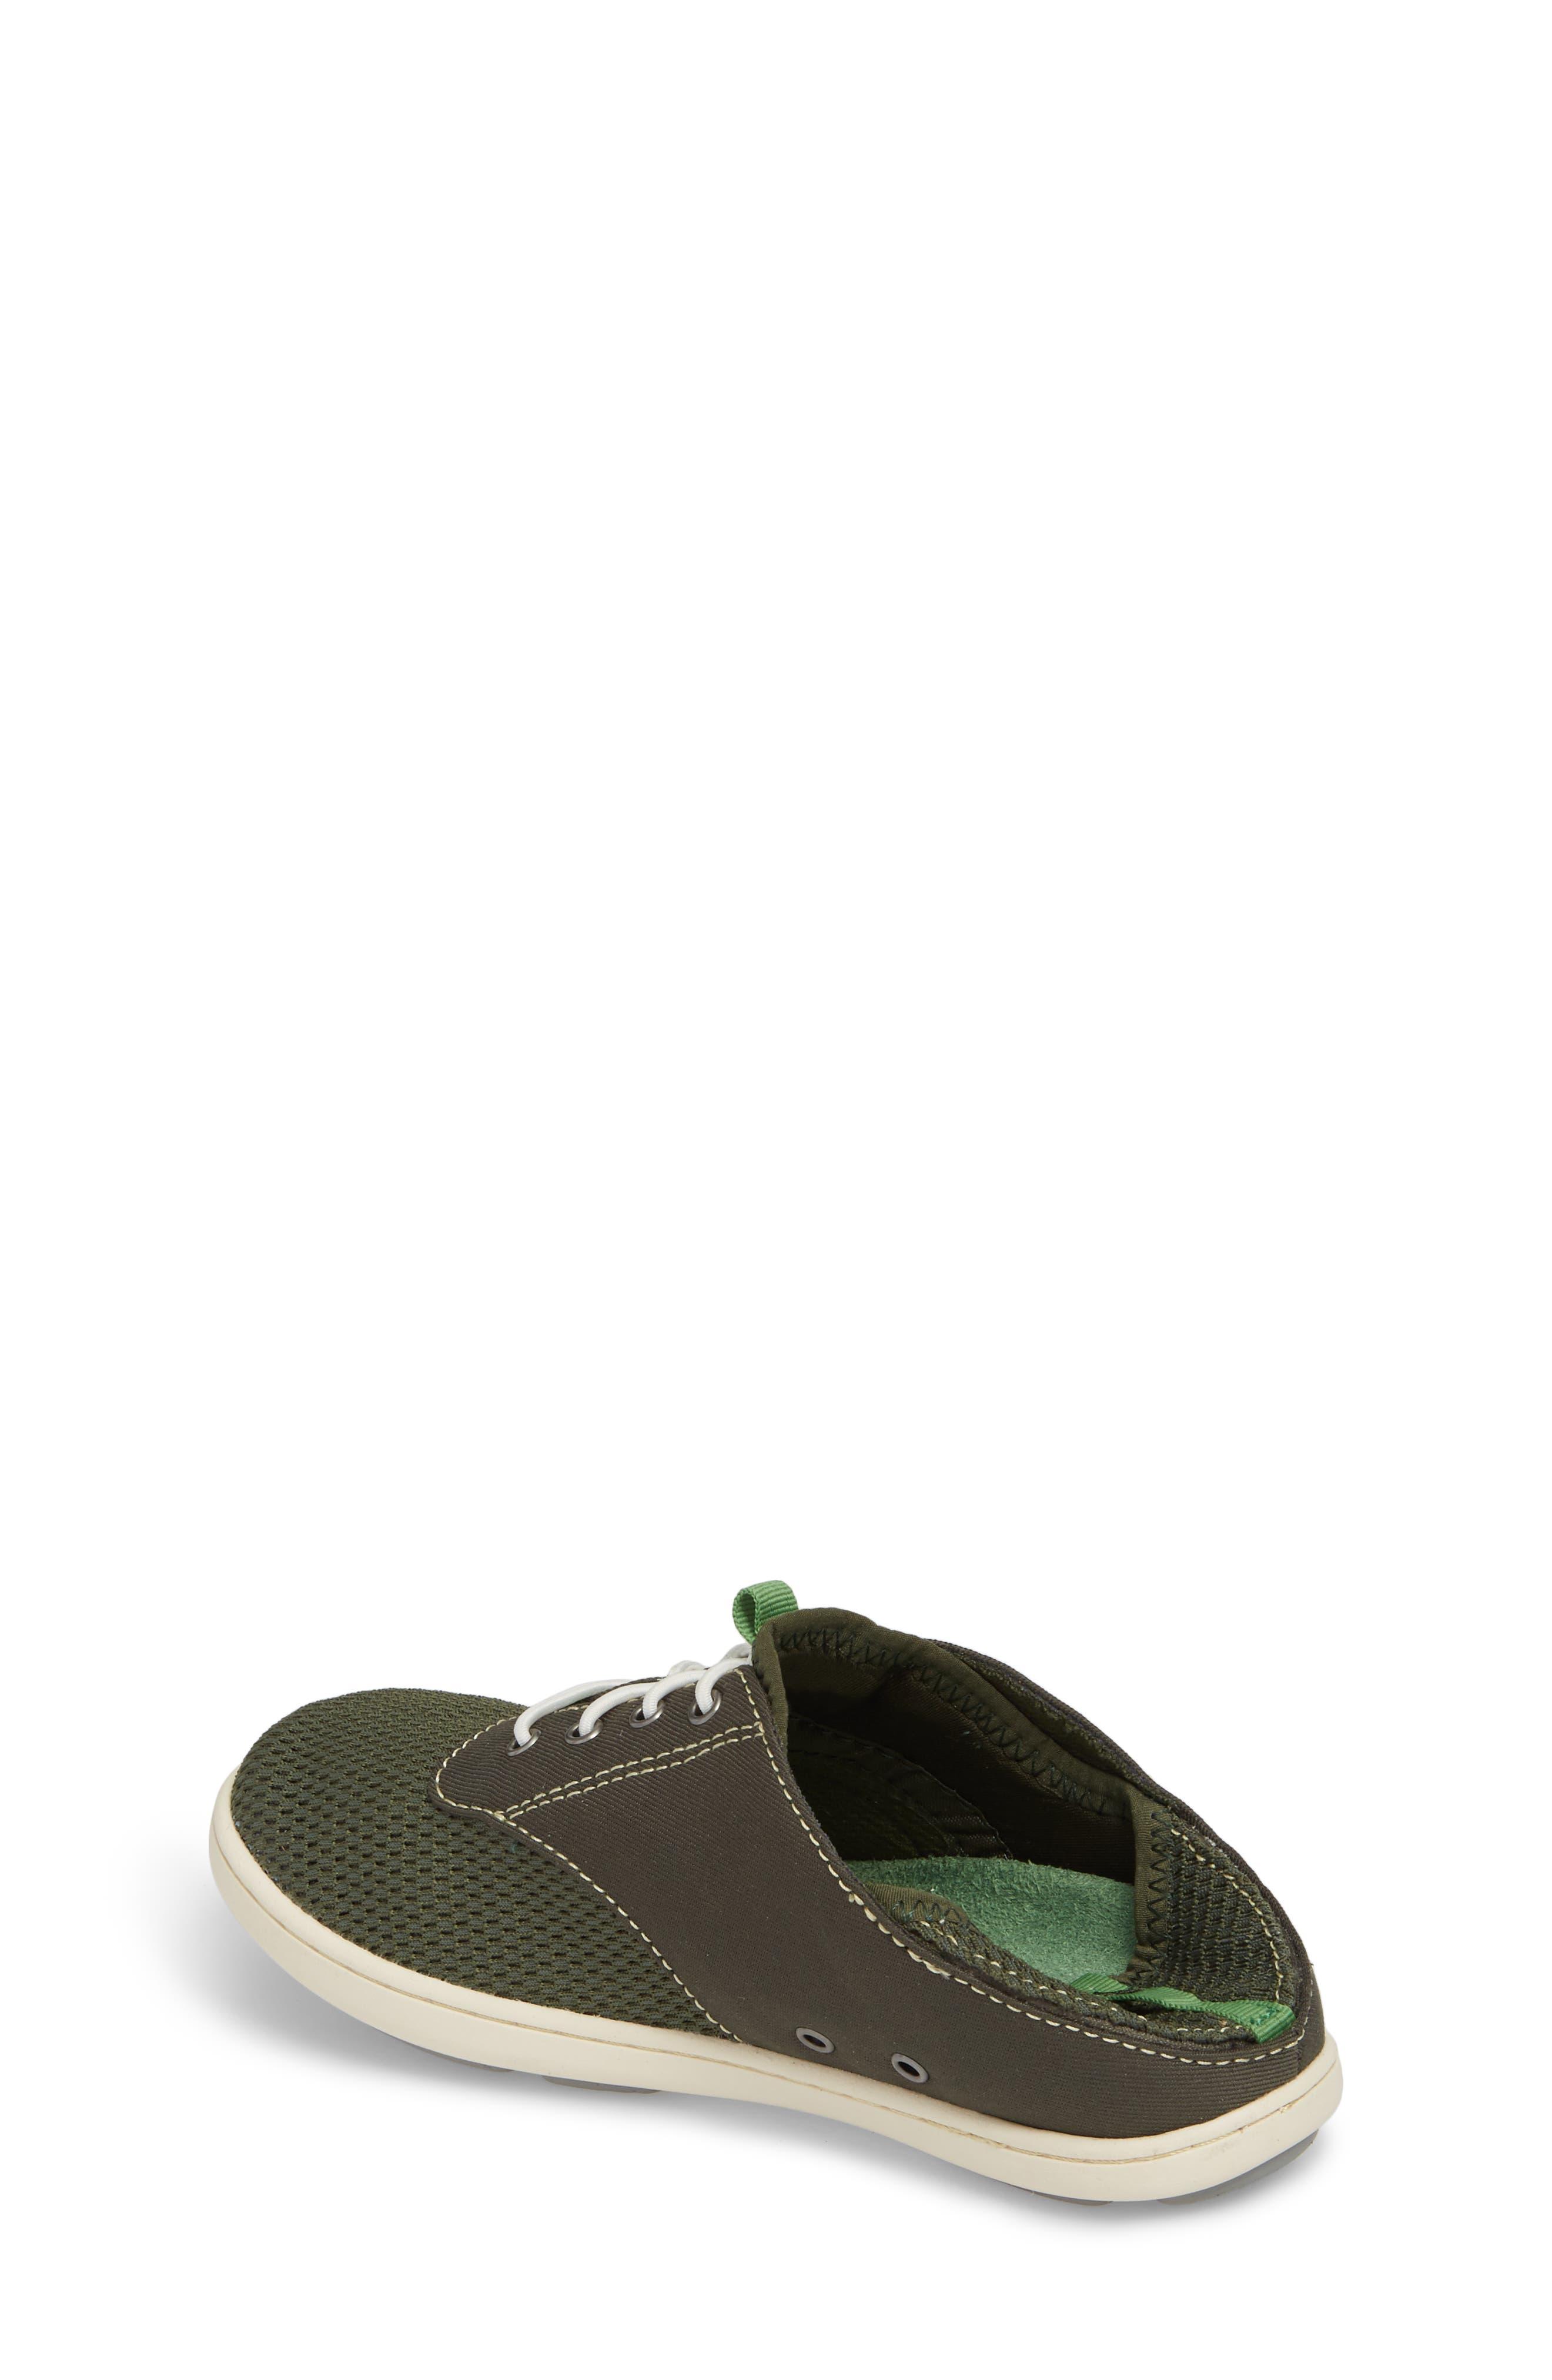 OLUKAI, Nohea Moku Water Resistant Shoe, Alternate thumbnail 3, color, SEA GRASS/ SEA GRASS